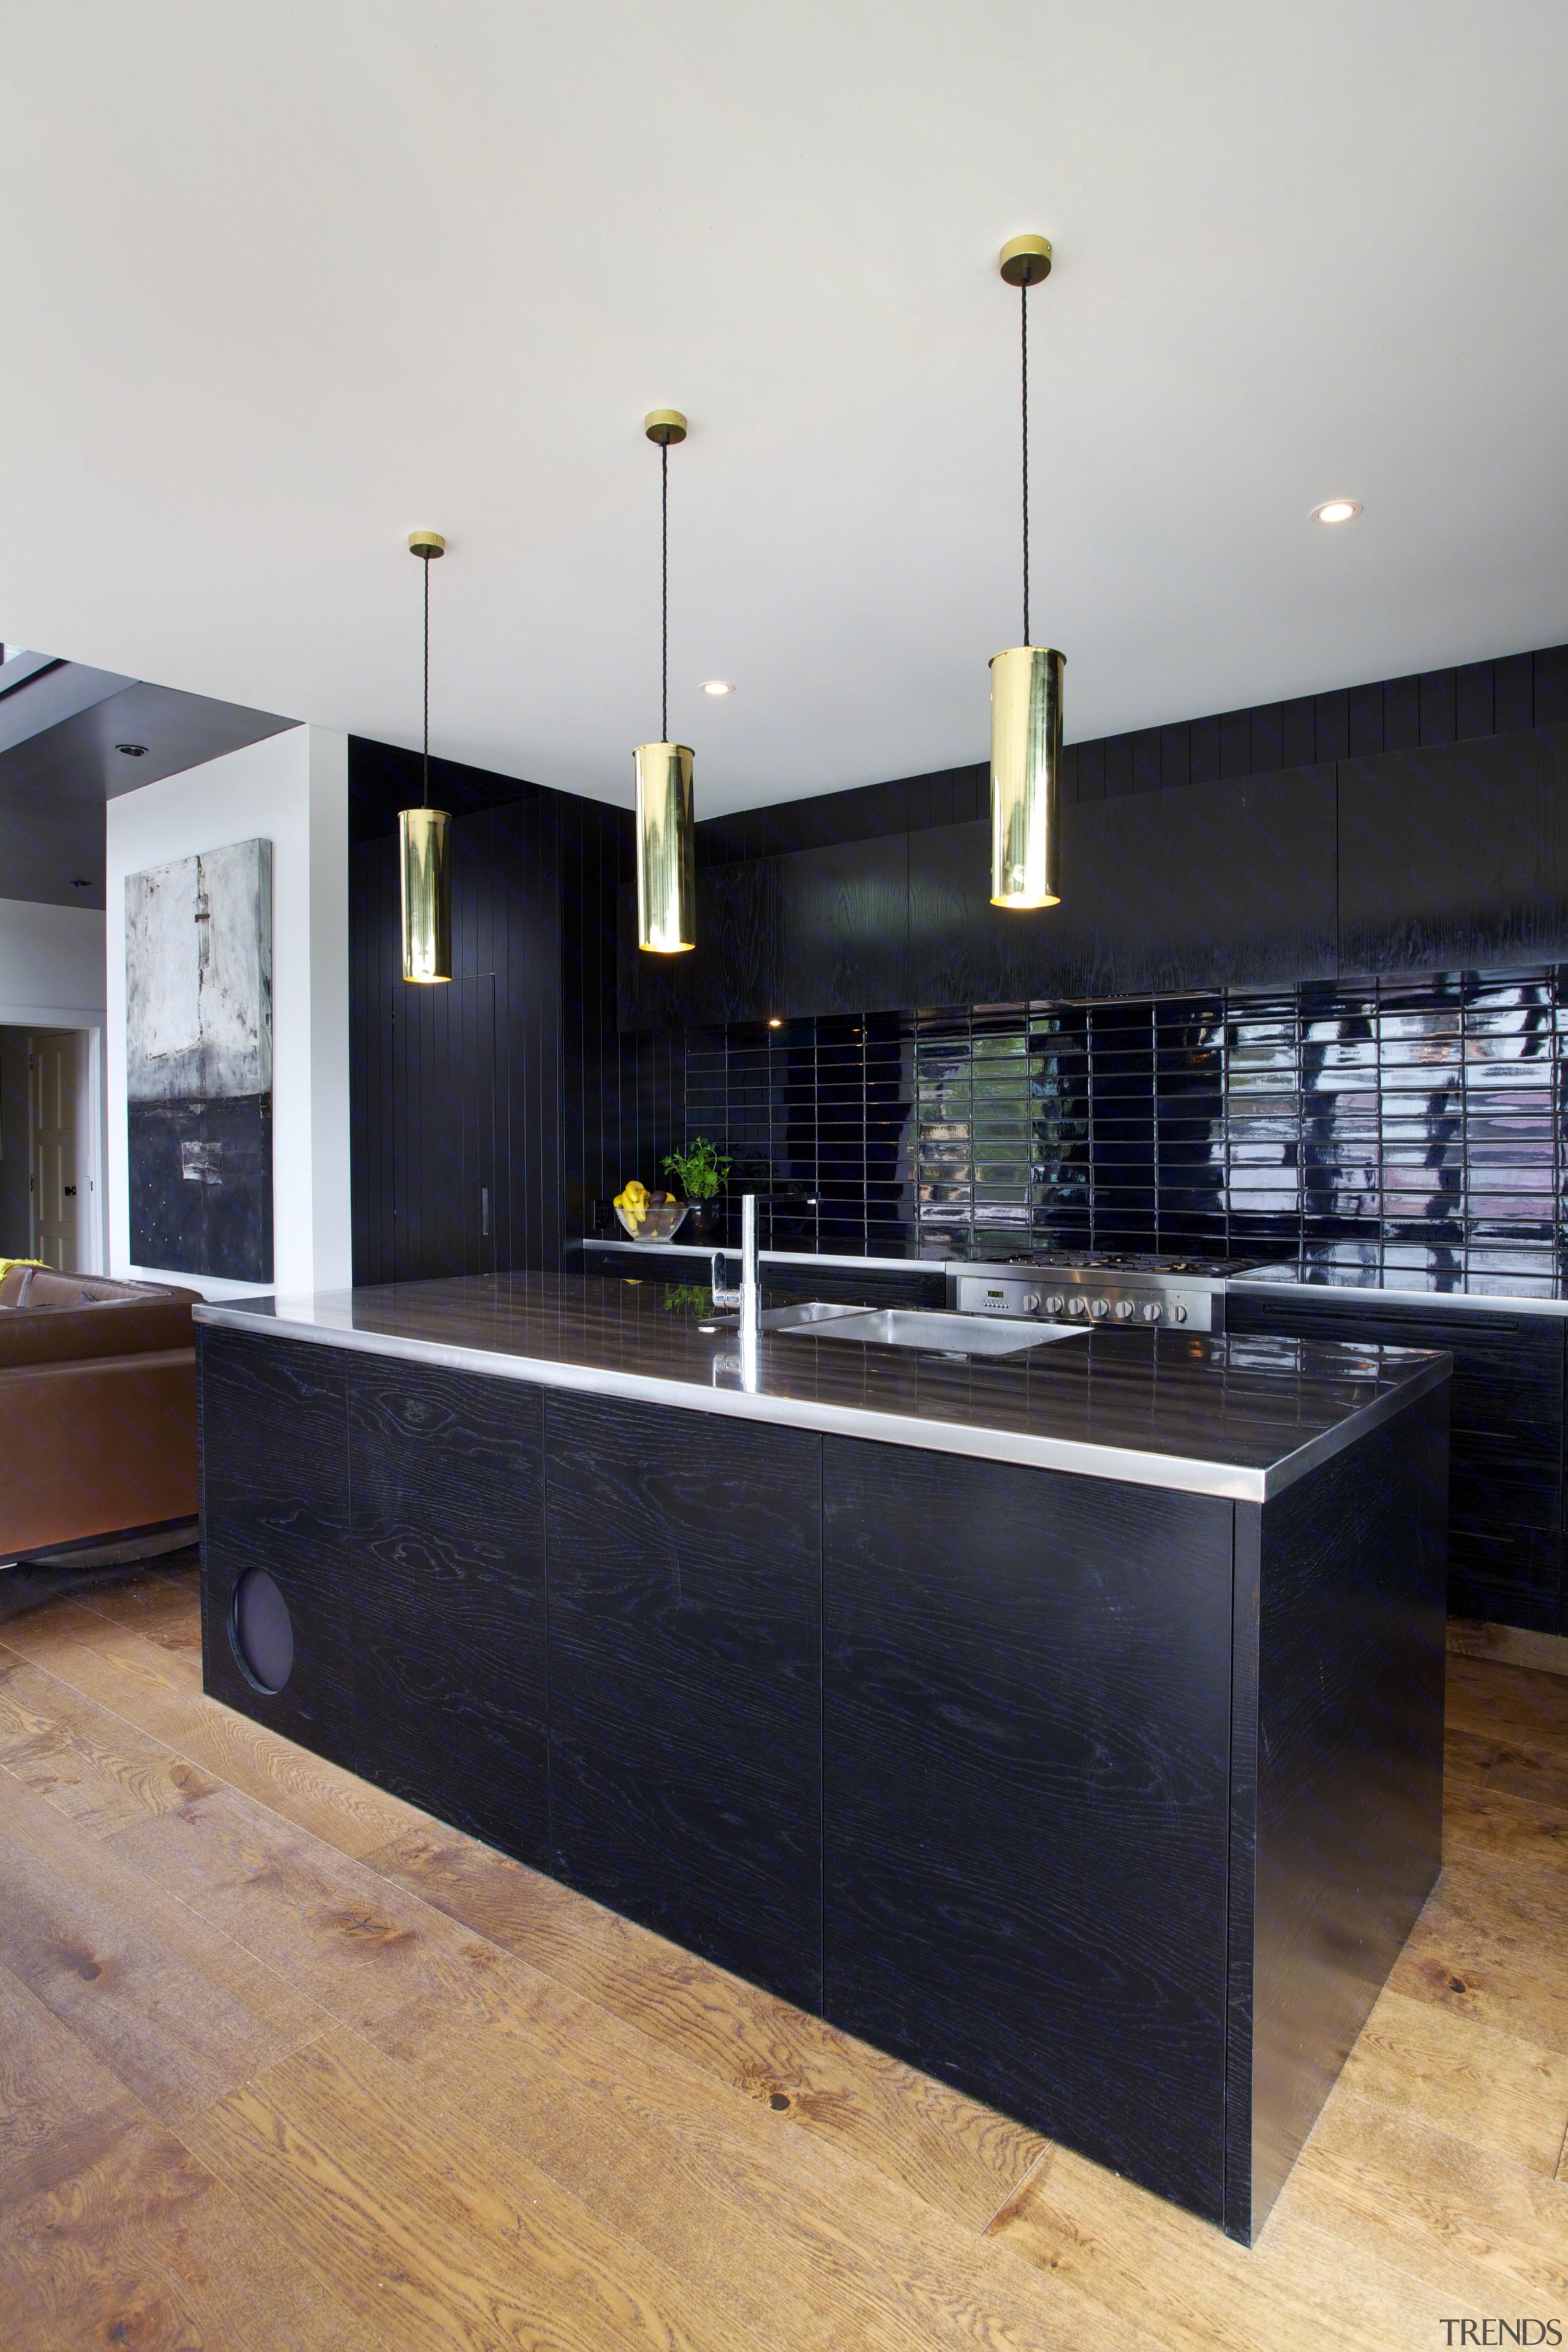 In this black kitchen there are three brass architecture, countertop, interior design, kitchen, black, white